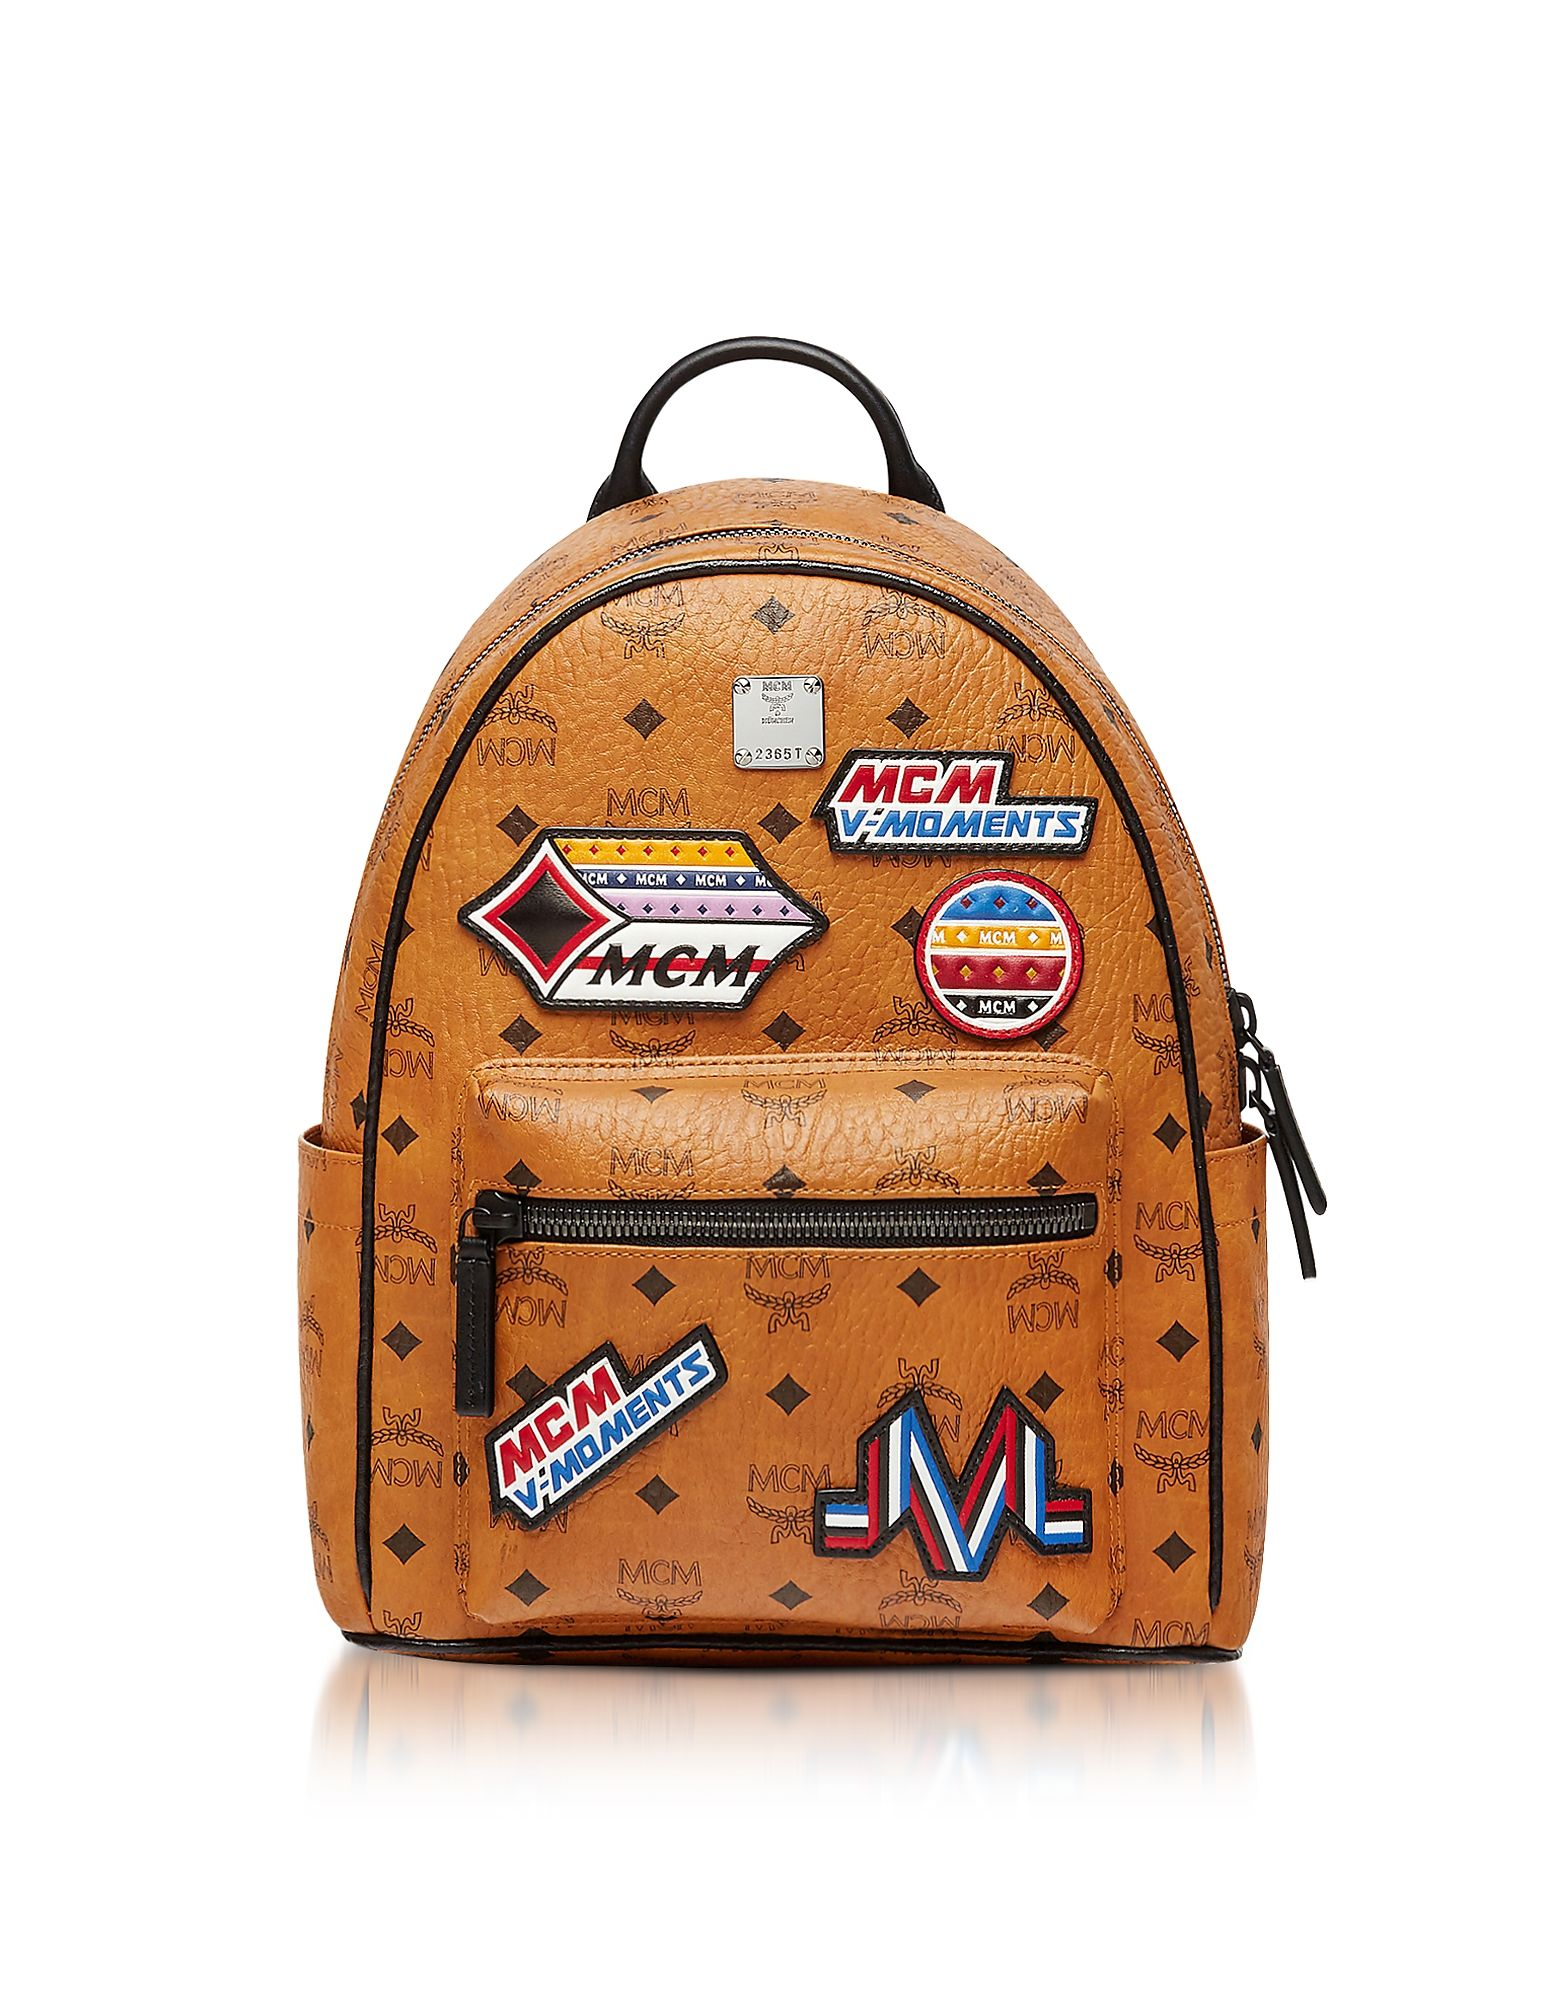 430bea7c1 MCM SMALL COGNAC VICTORY PATCH VISETOS STARK BACKPACK. #mcm #bags  #backpacks #